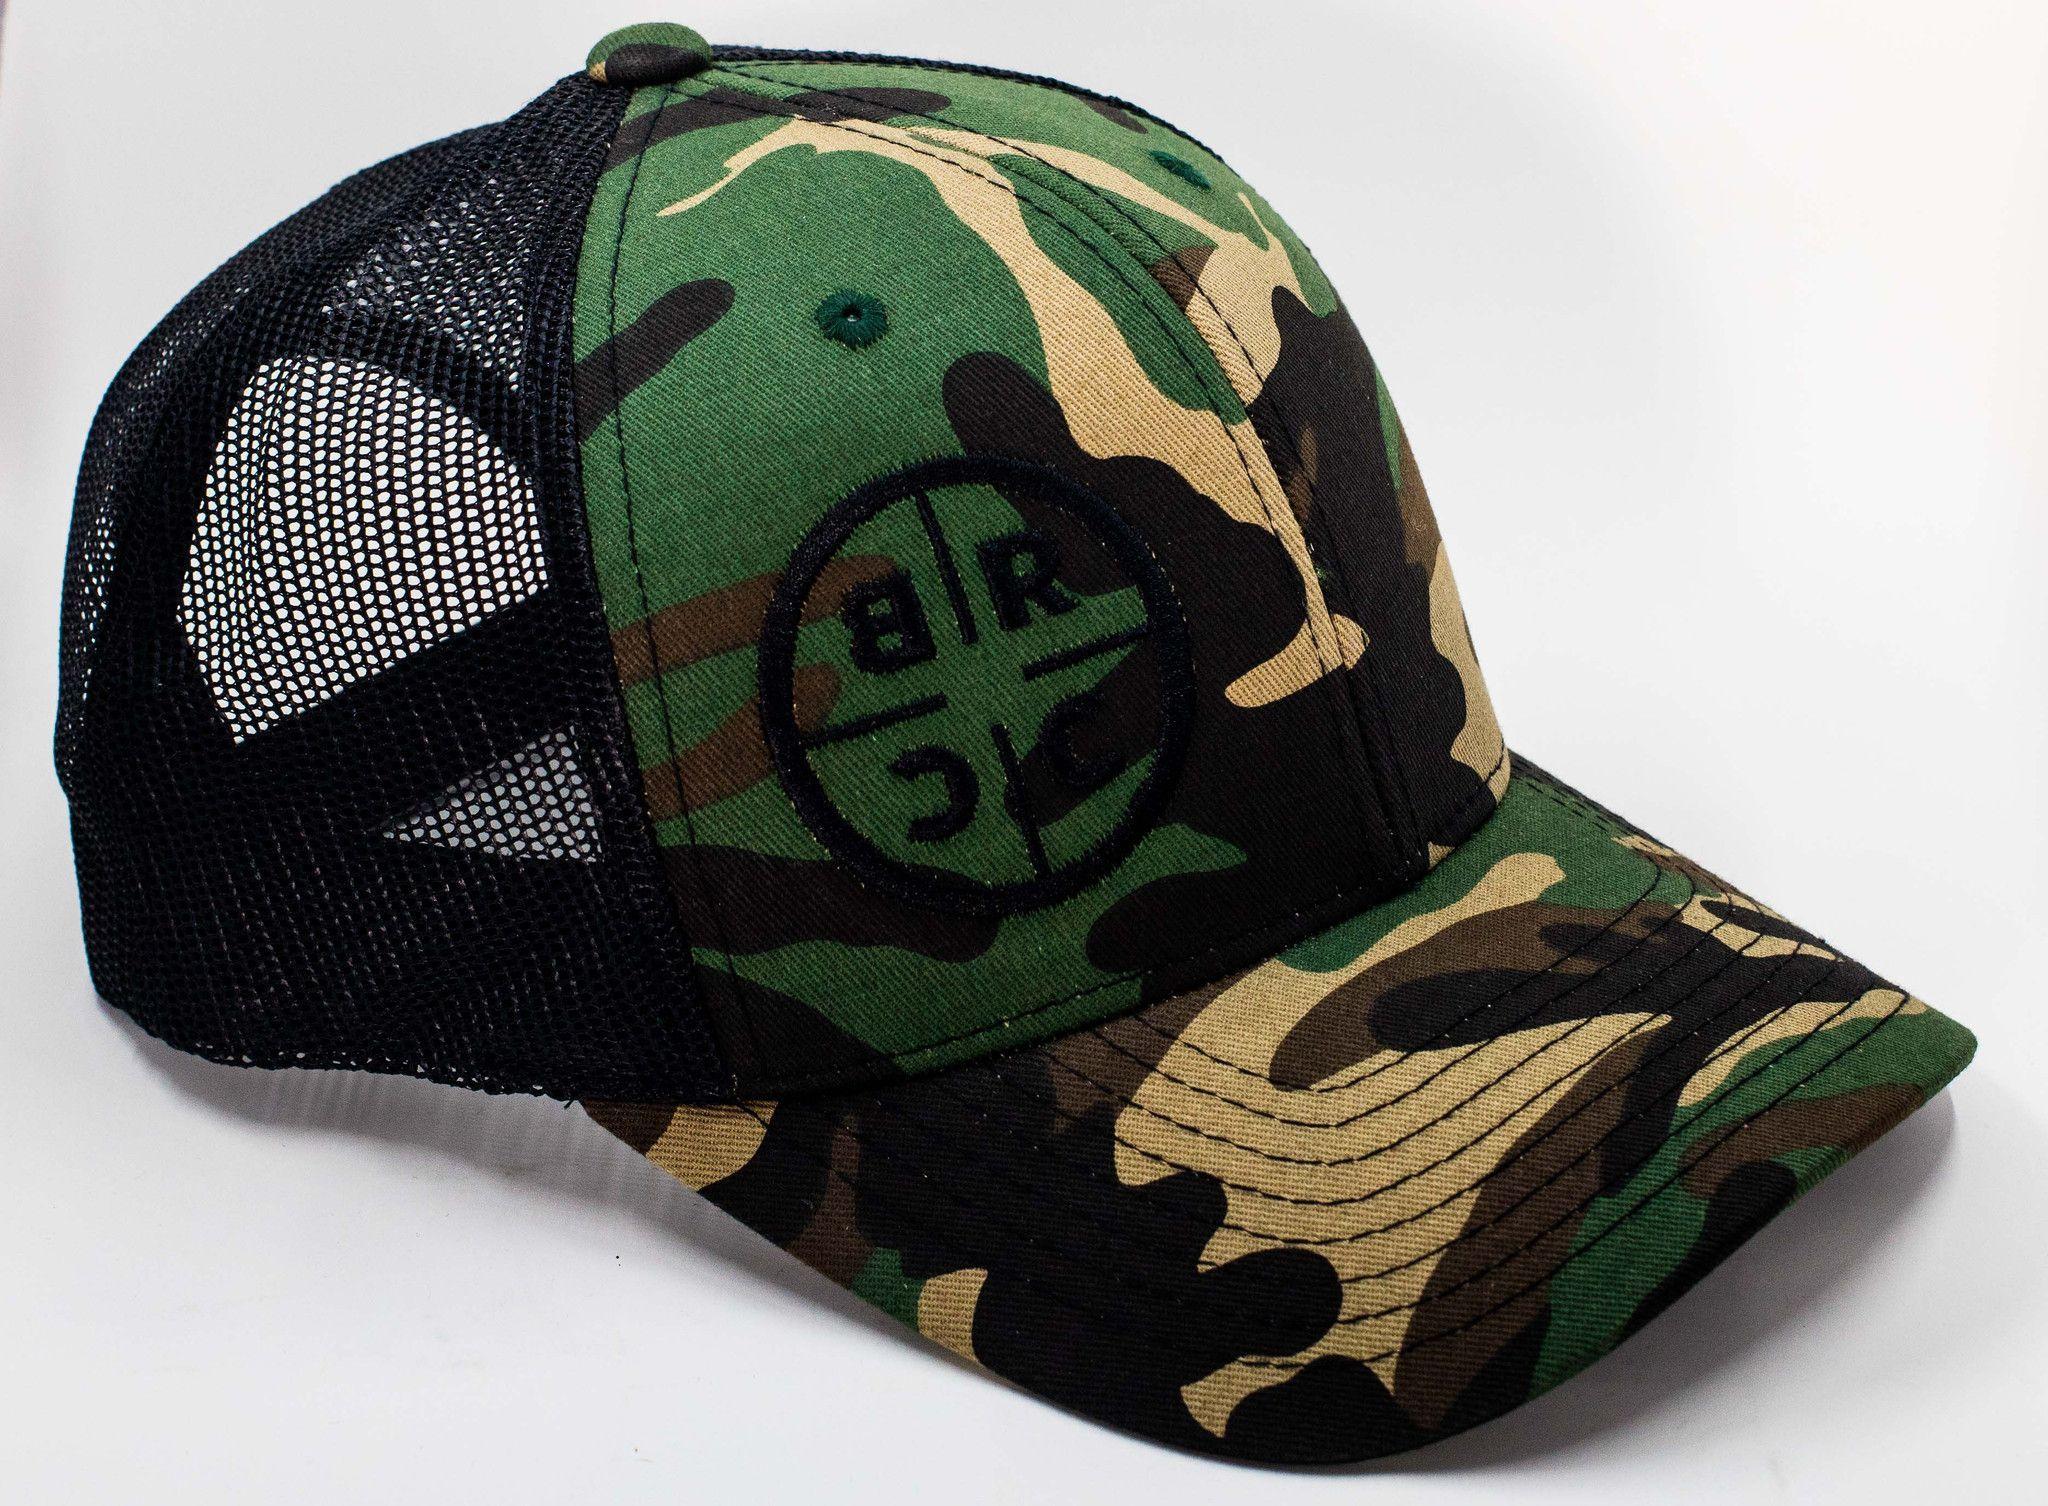 f13c36fe01967 BRCC Trucker Hat - Camo with Black mesh